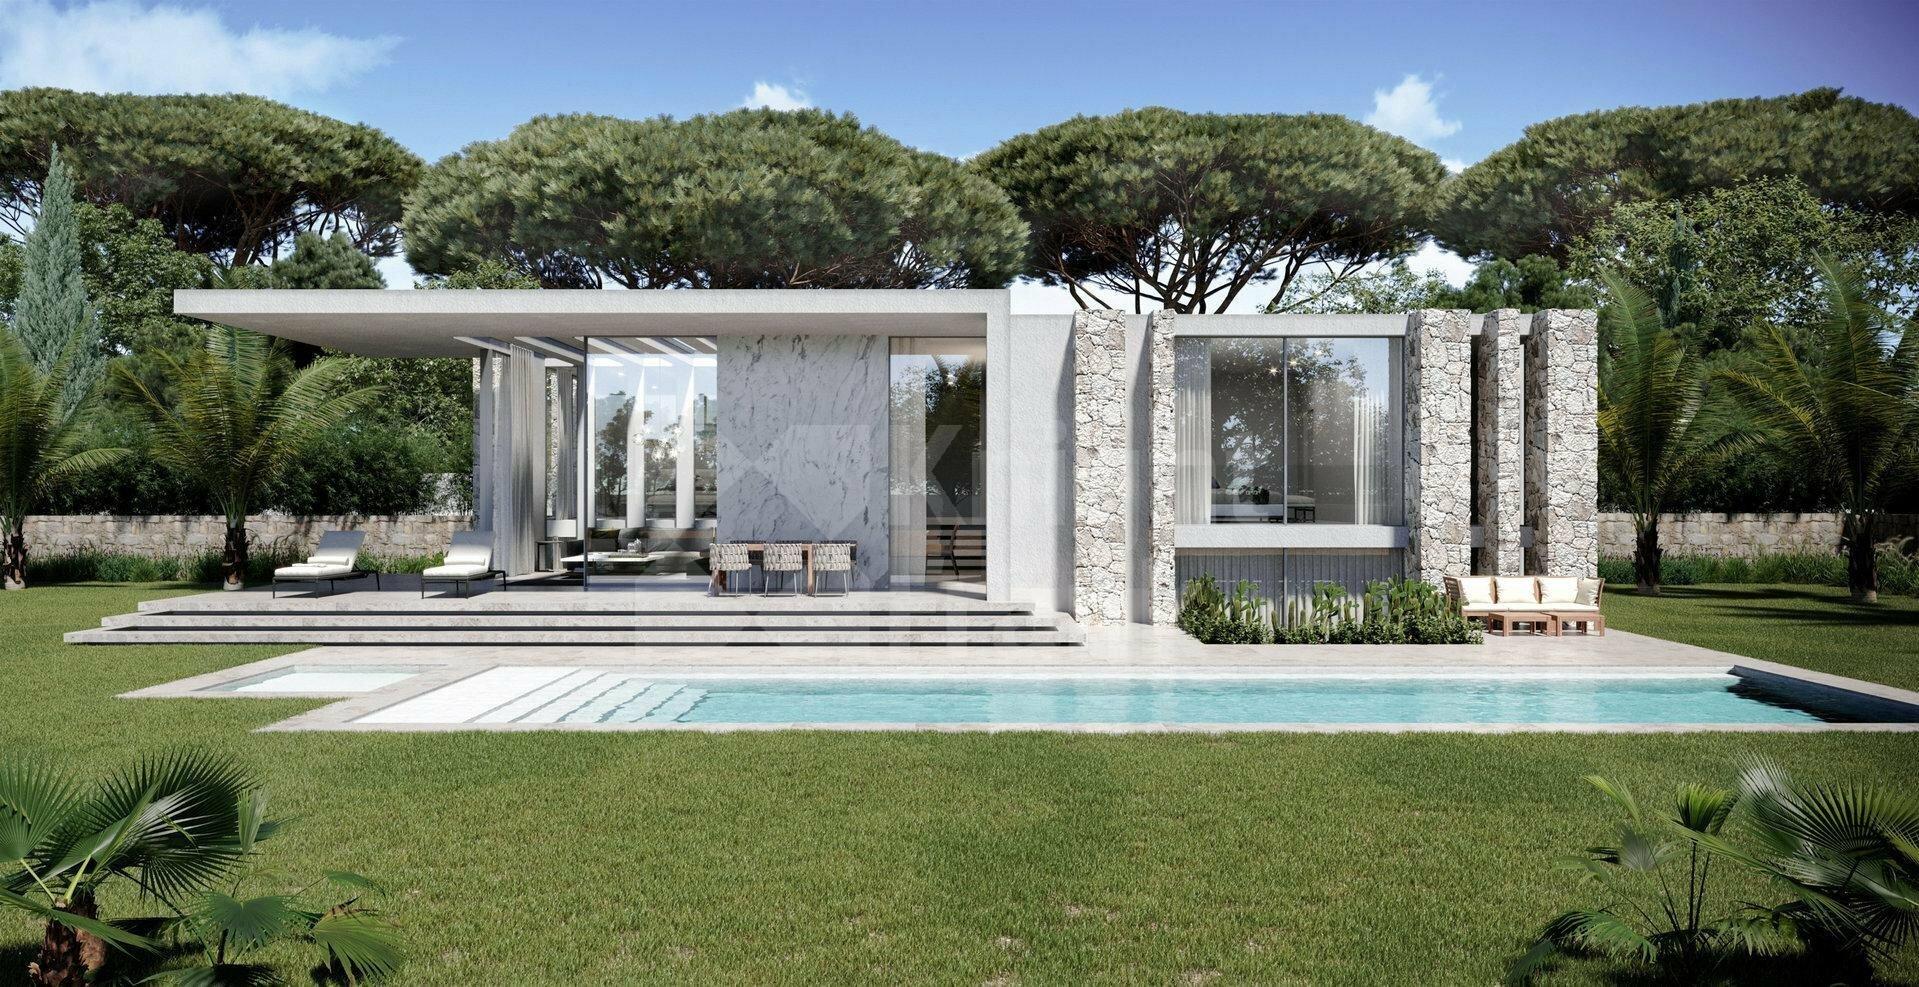 Villa in Antibes, Provence-Alpes-Côte d'Azur, France 1 - 11424151